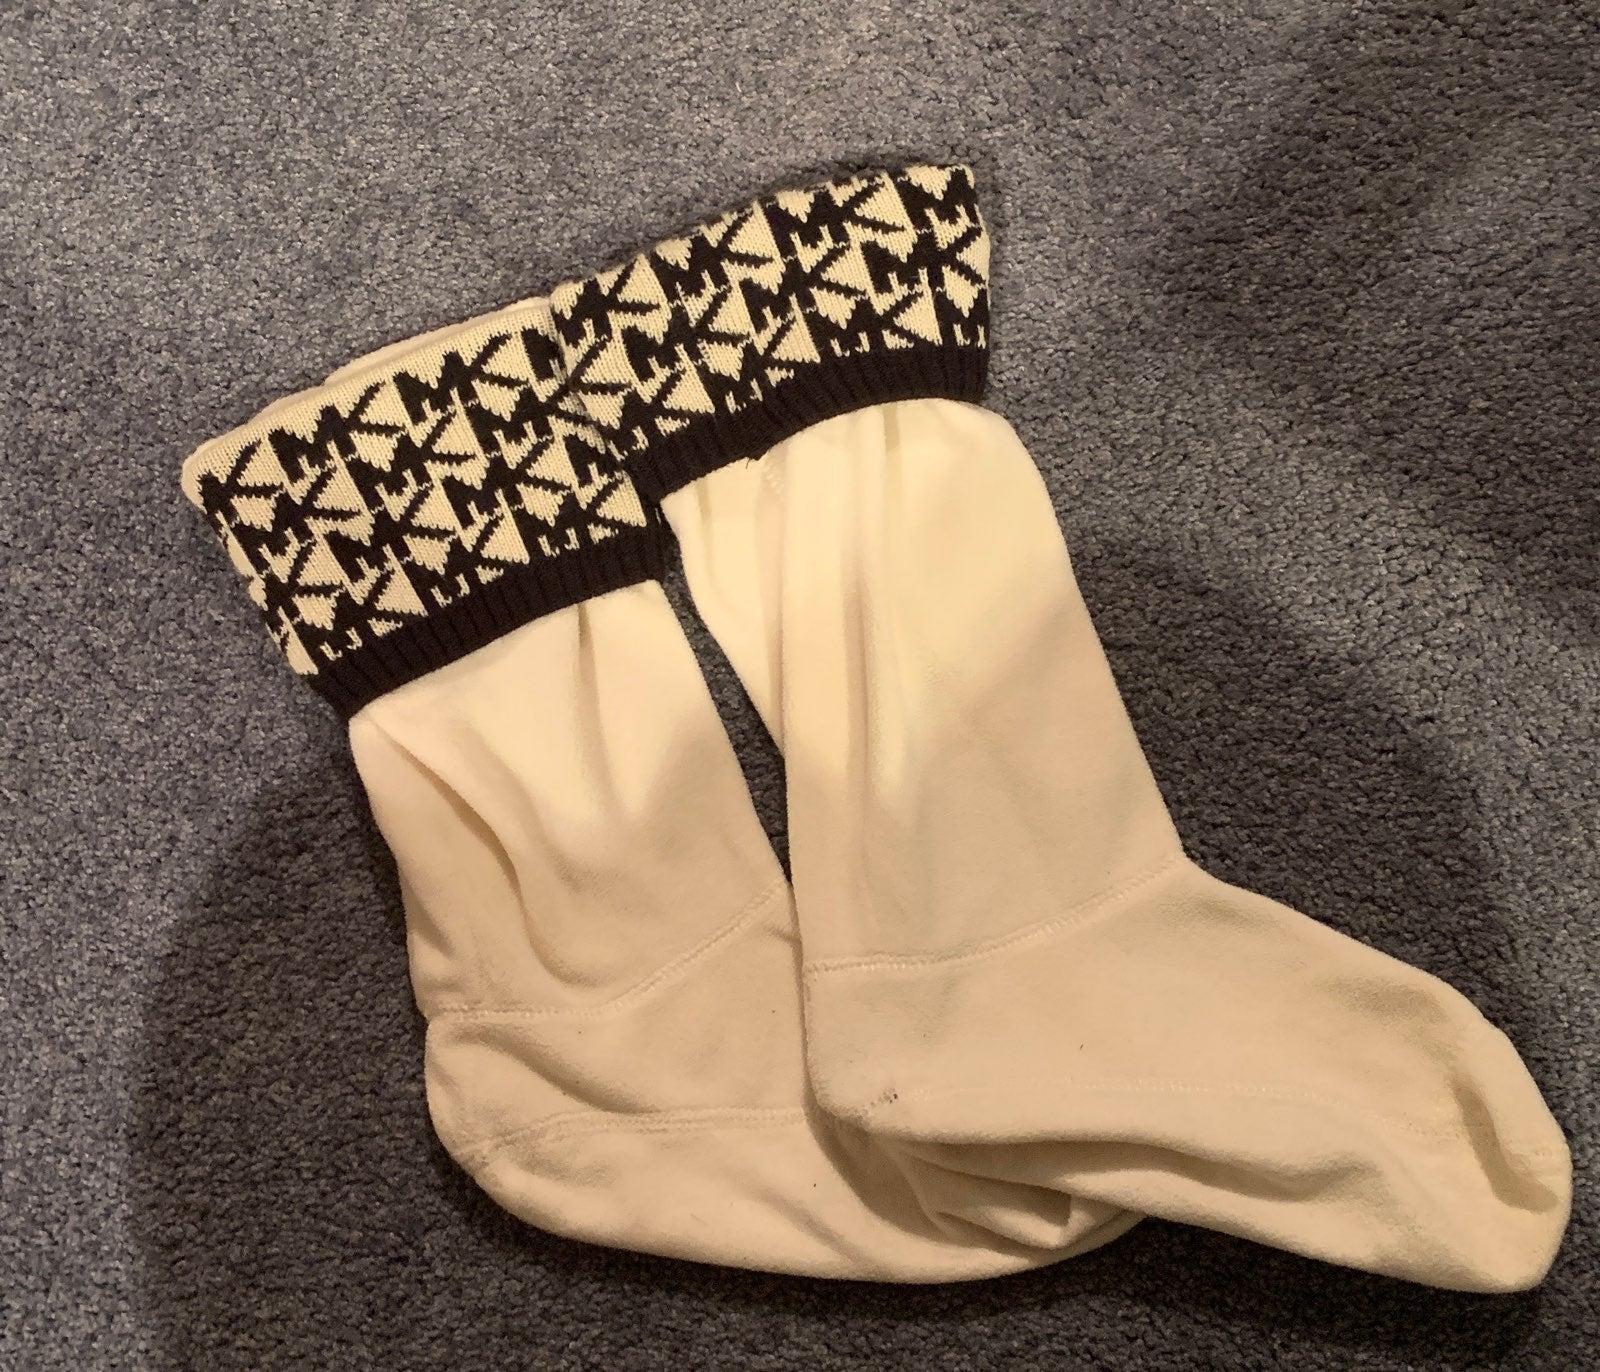 michael kors boot covers